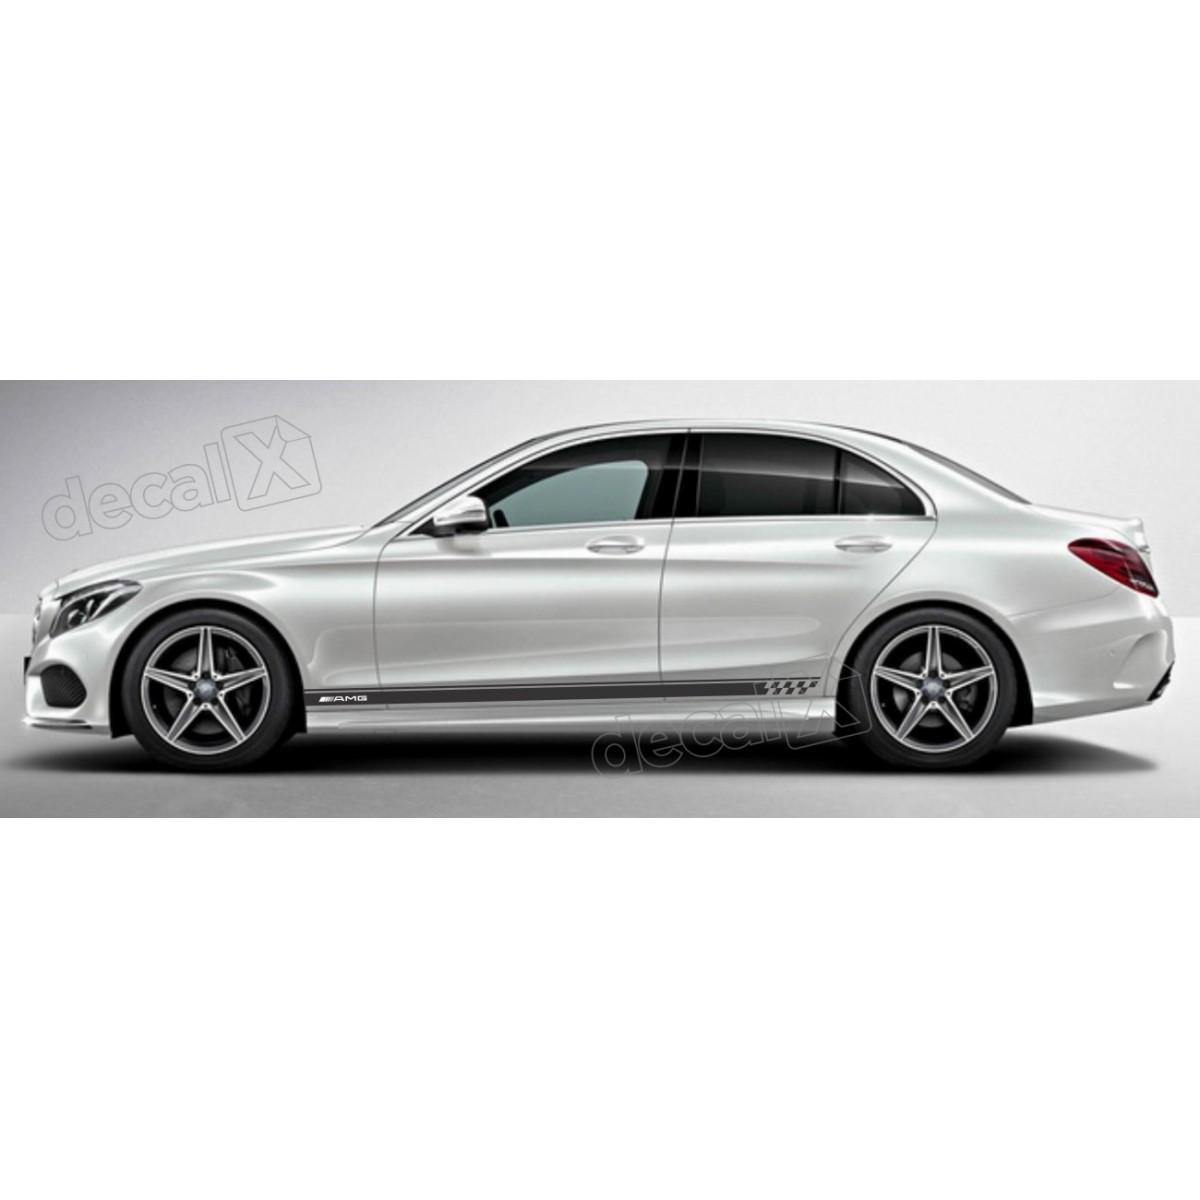 Adesivo Faixa Lateral Mercedes 3m A25